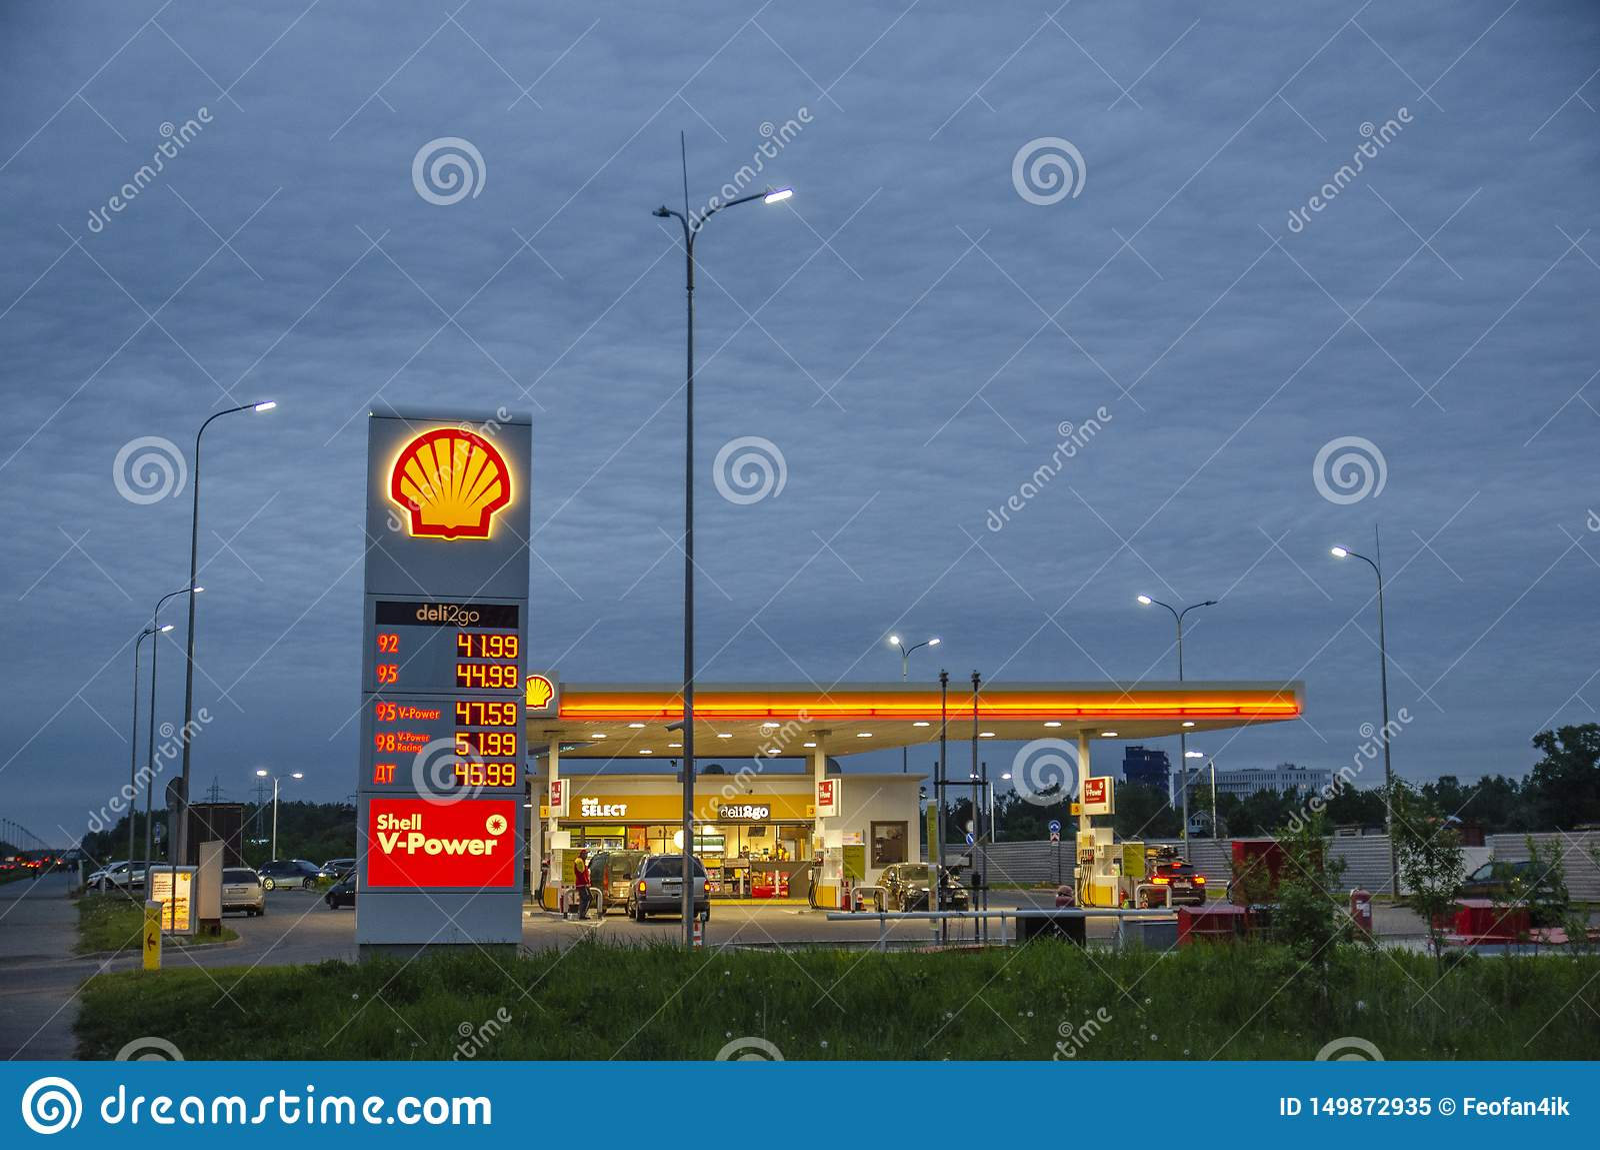 ST Η ΠΕΤΡΟΥΠΟΛΗ, Ρωσία, μπορεί, το 2019  βενζινάδικο κοχυλιών στην οδό αλεξίπτωτων όμορφα σύννεφα στο υπόβαθρο του βενζινάδικου